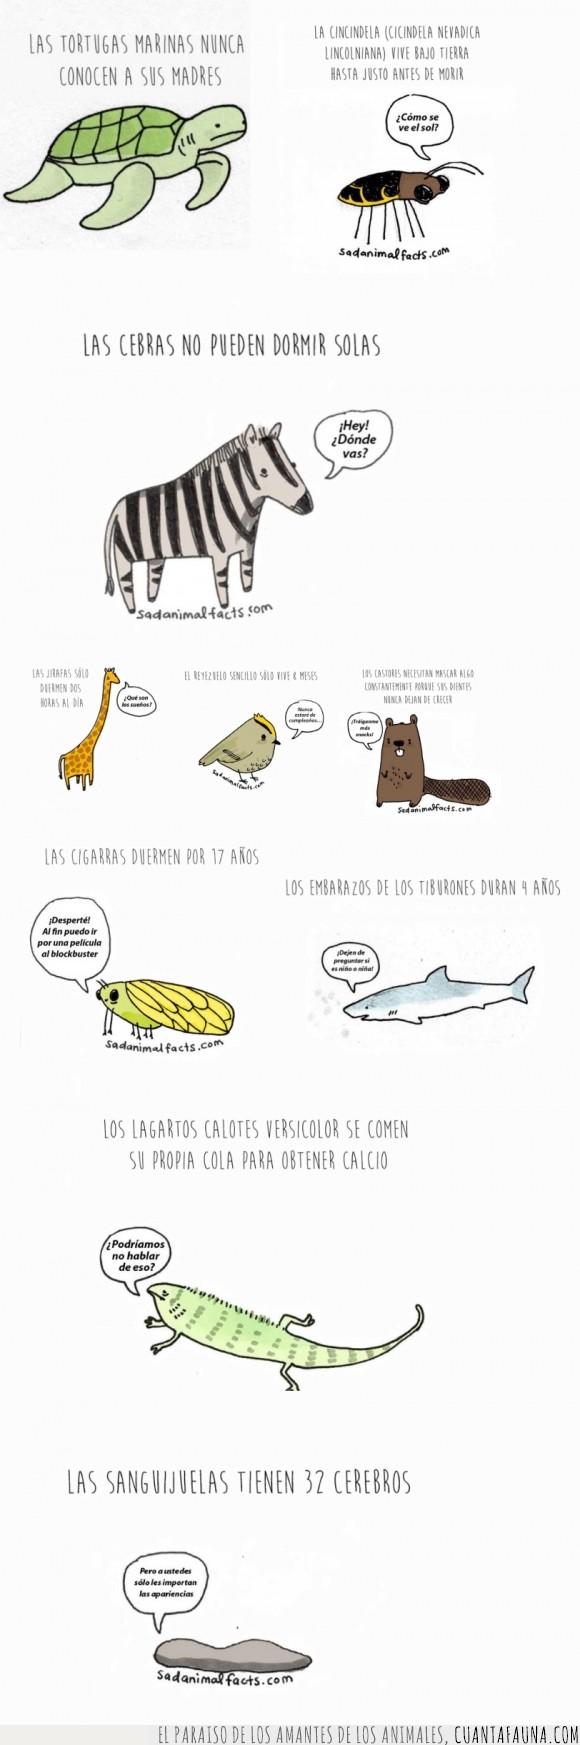 animales,babosa,castor,complejos,cosas,jirafa,lagartija,luciernaga,tiburon,tortuga,un pajarito,una jodida cebra